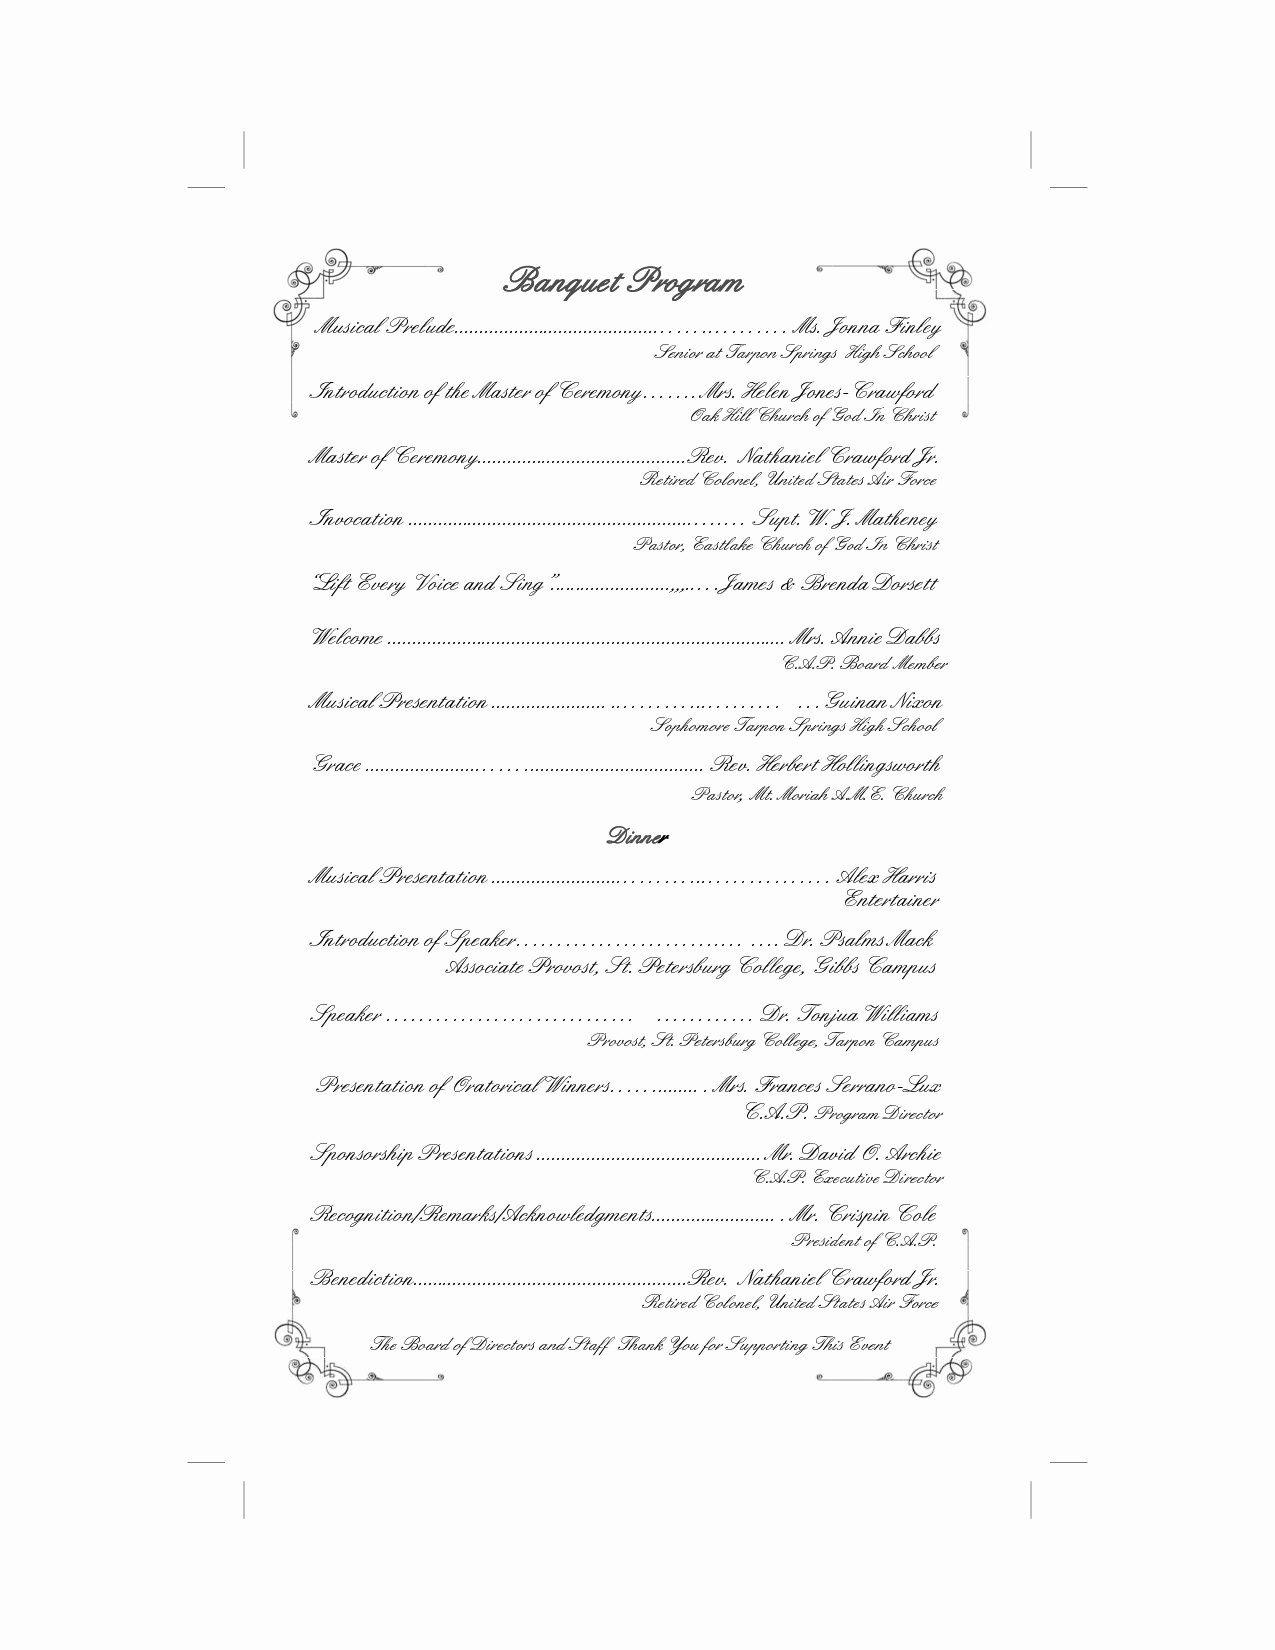 Banquet Program Template Elegant Best S Of Pastor Retirement Program Retirement